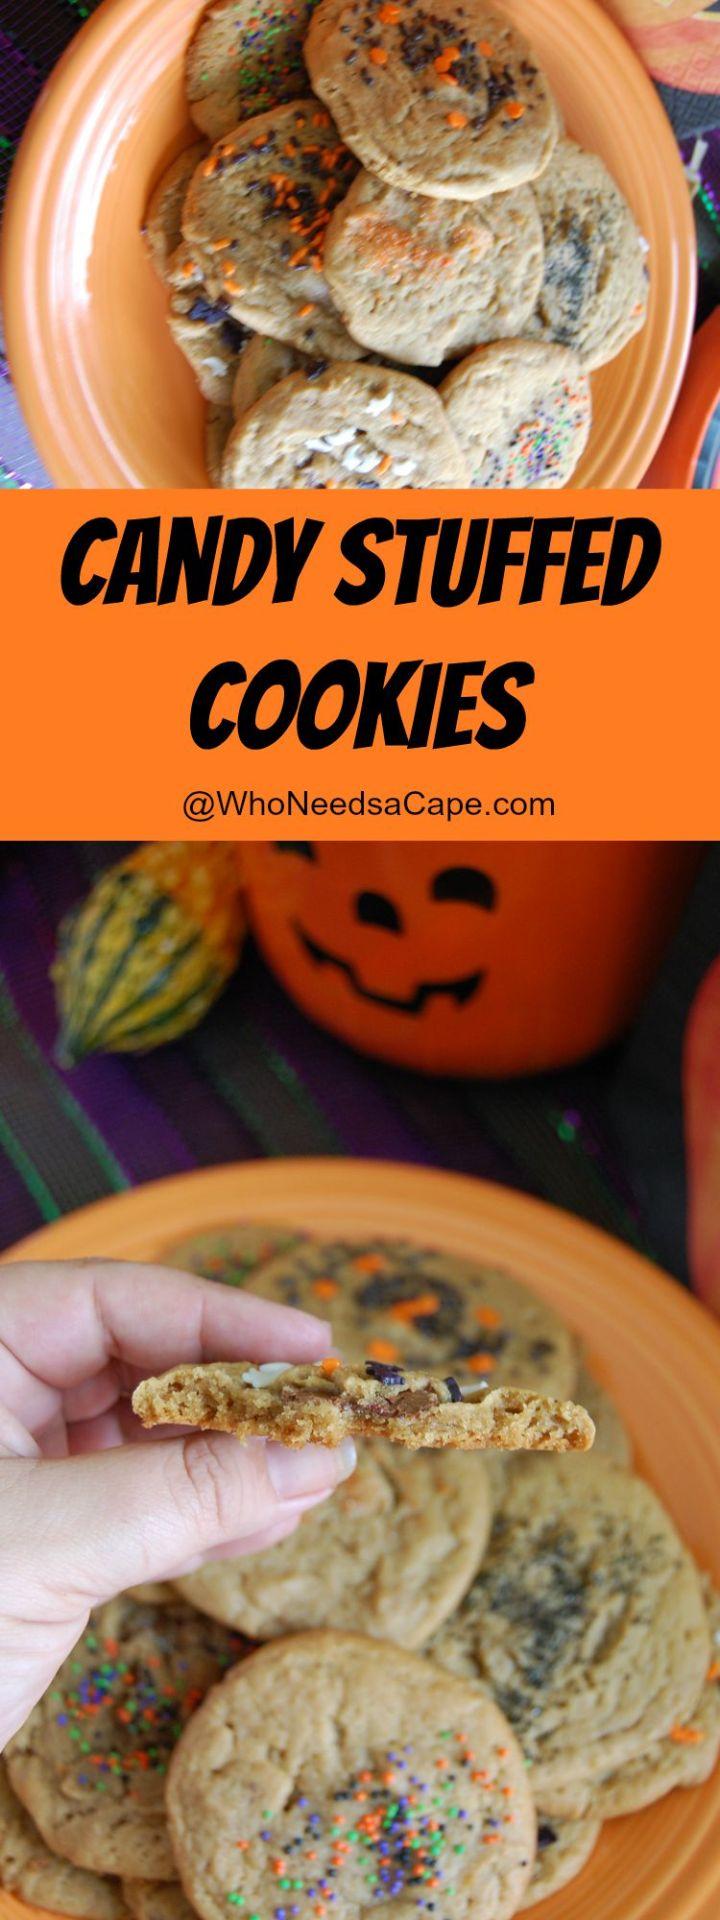 Candy Stuffed Cookies 1